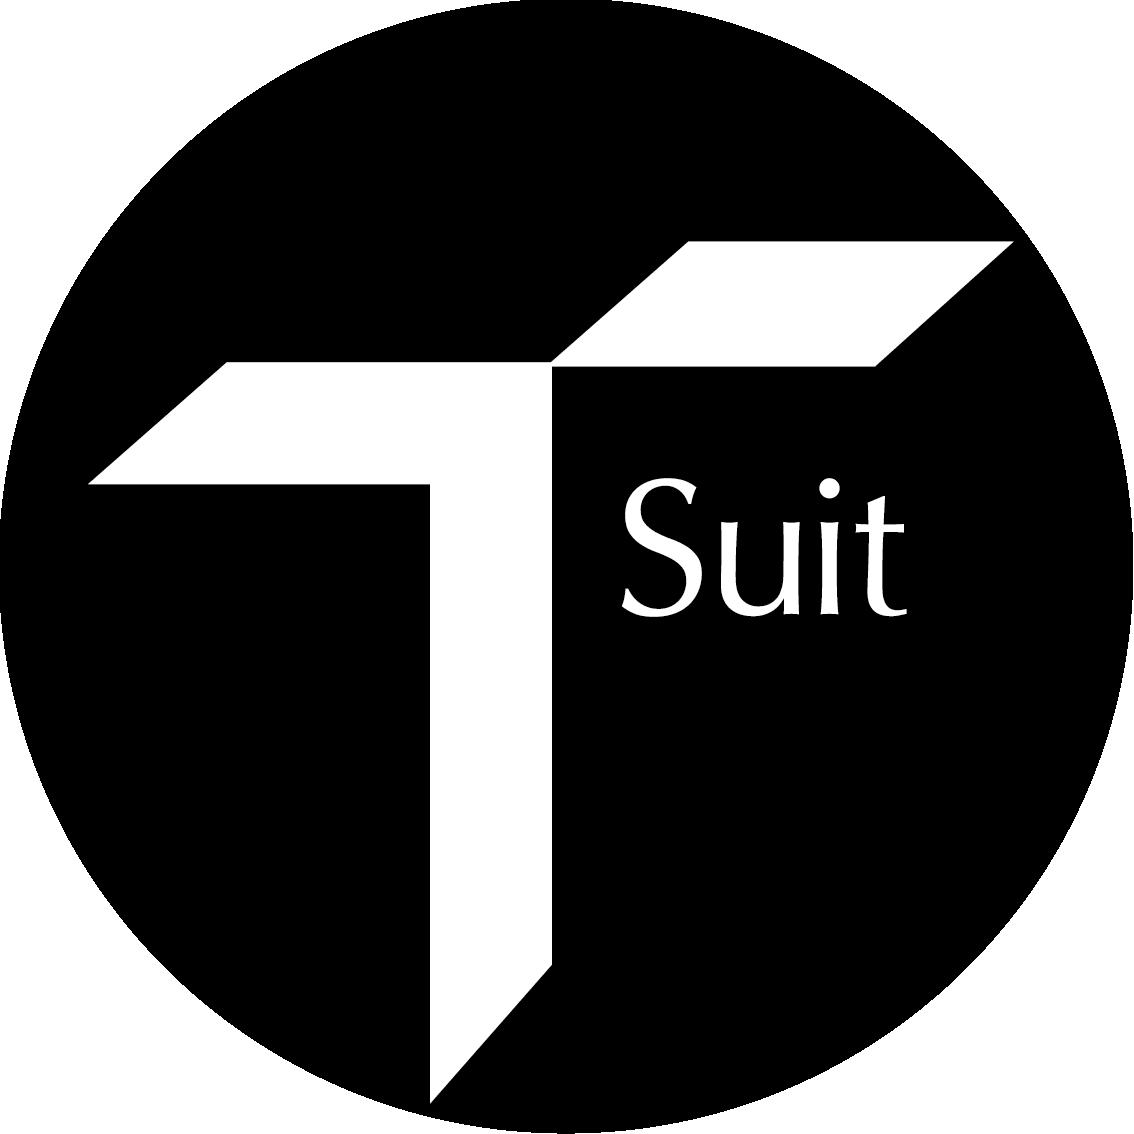 Tsuit